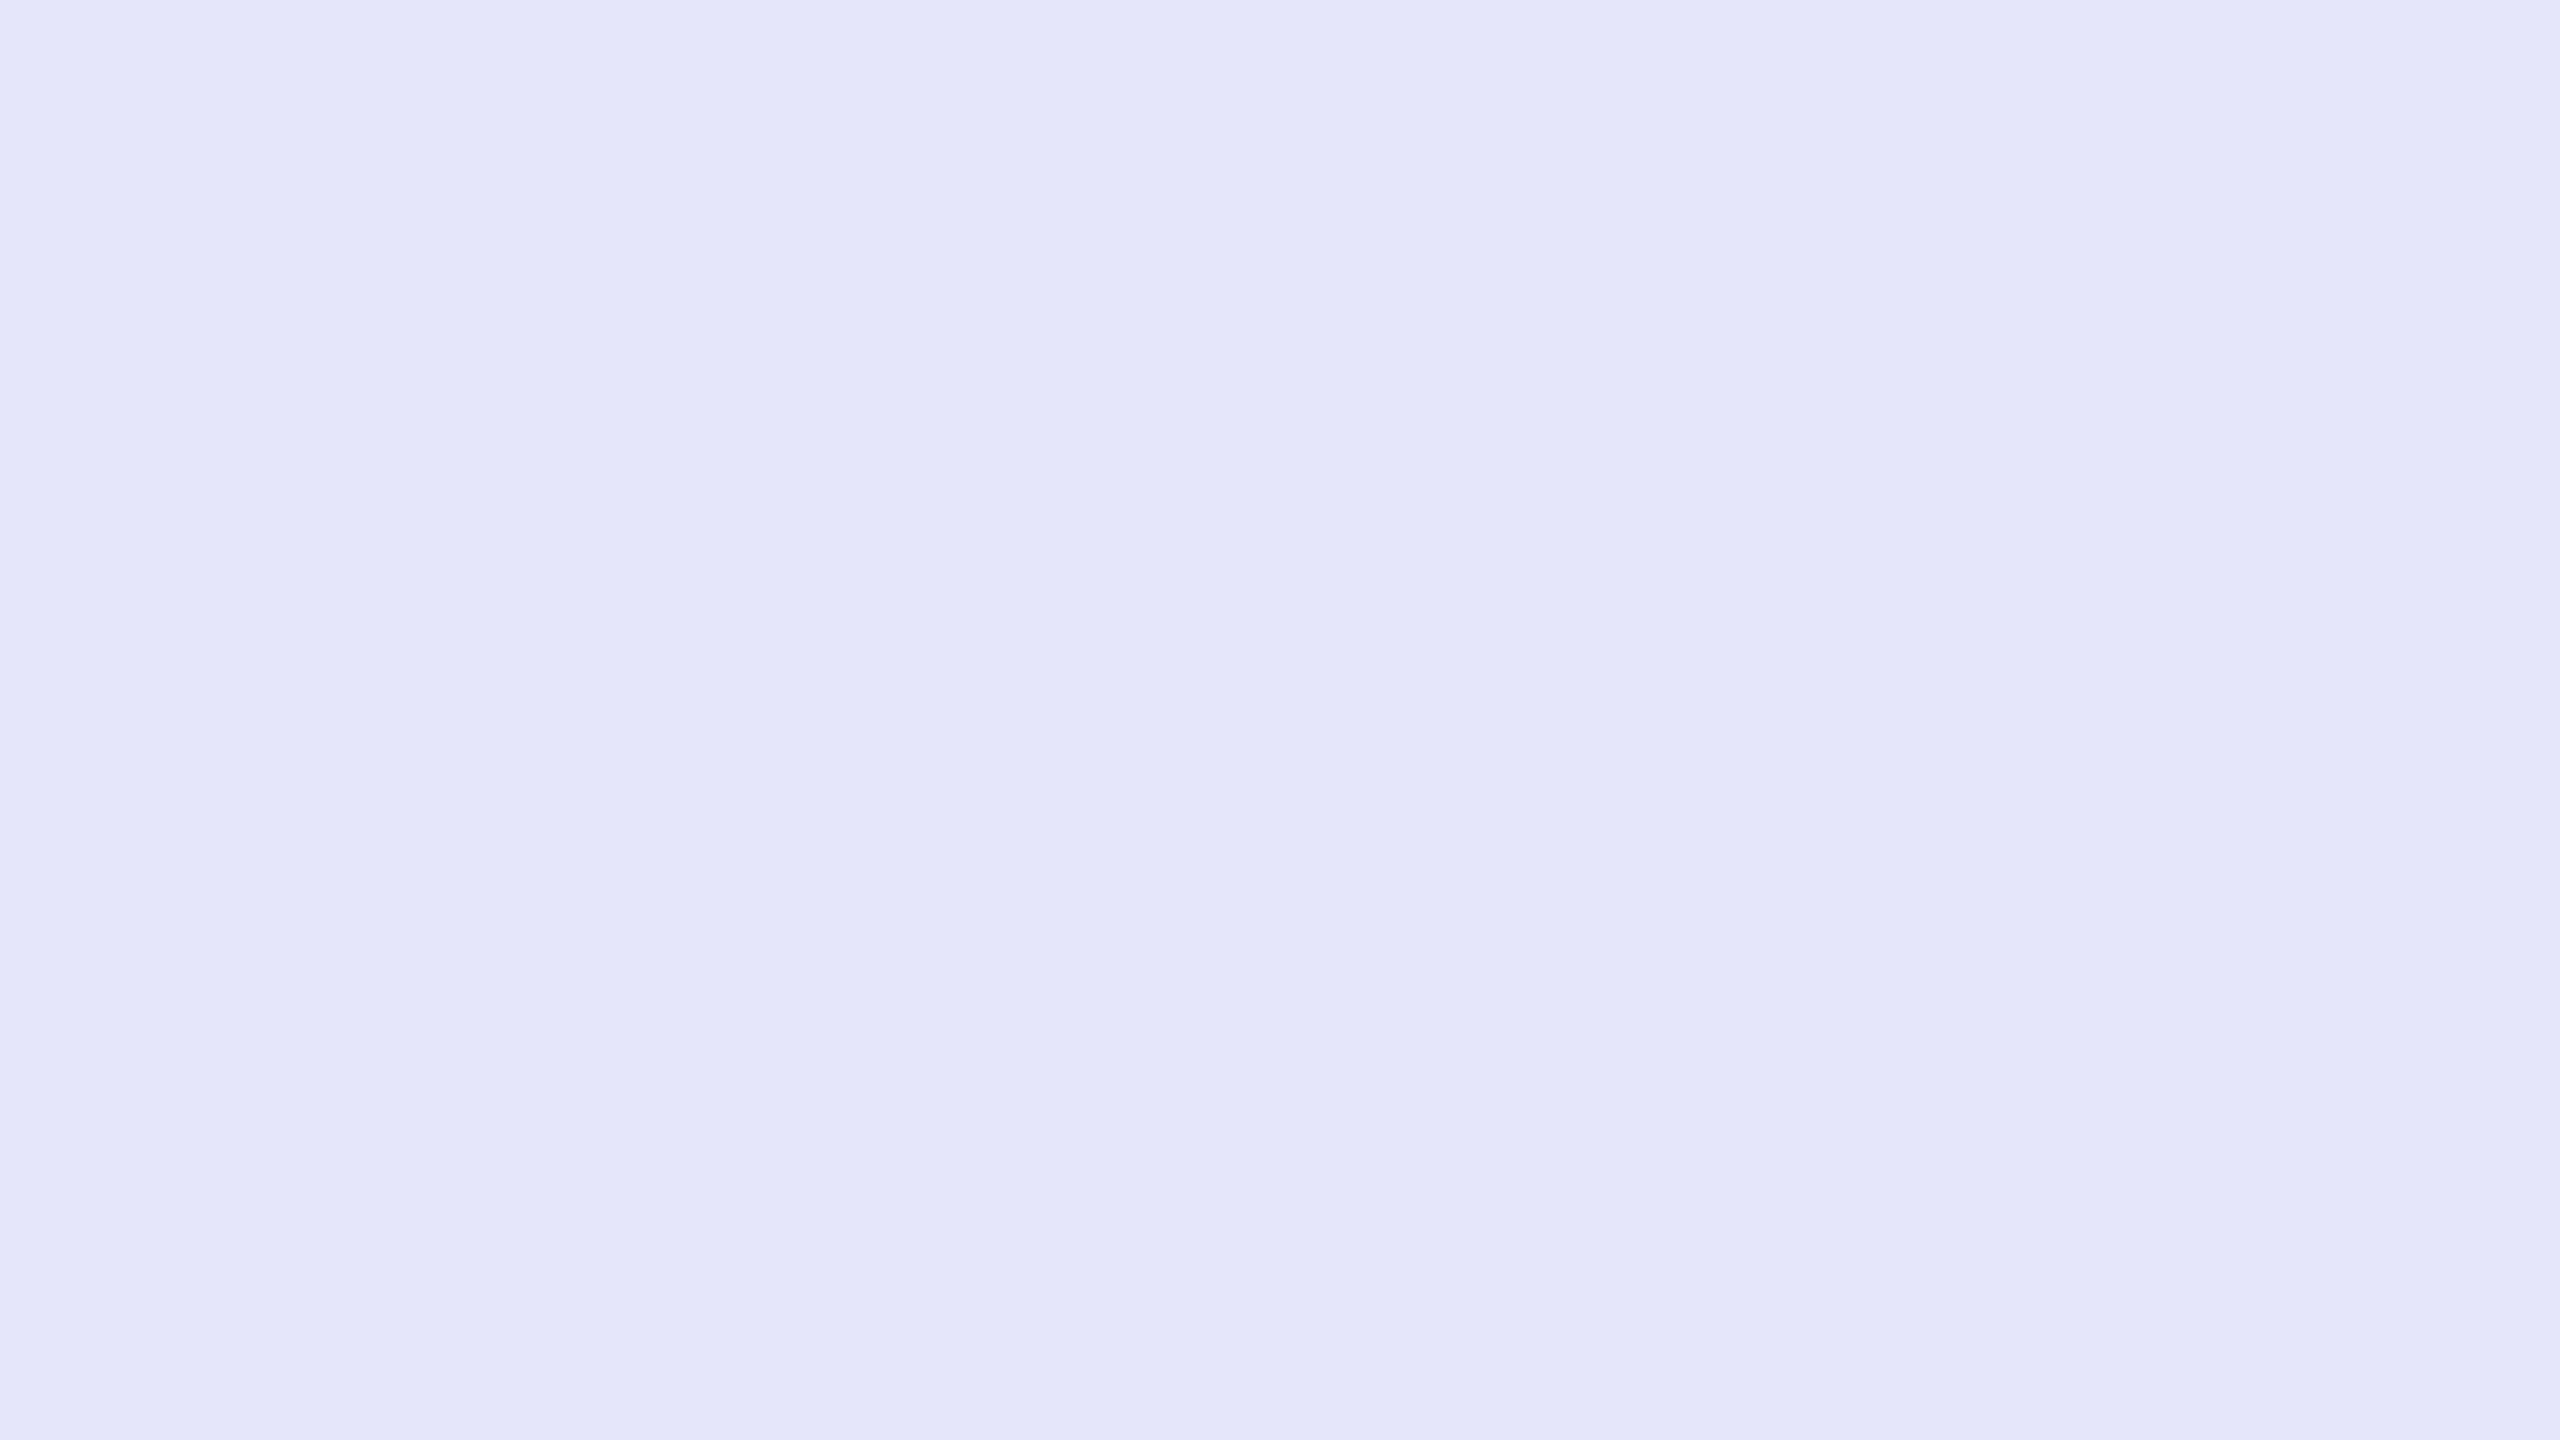 2560x1440 Lavender Web Solid Color Background